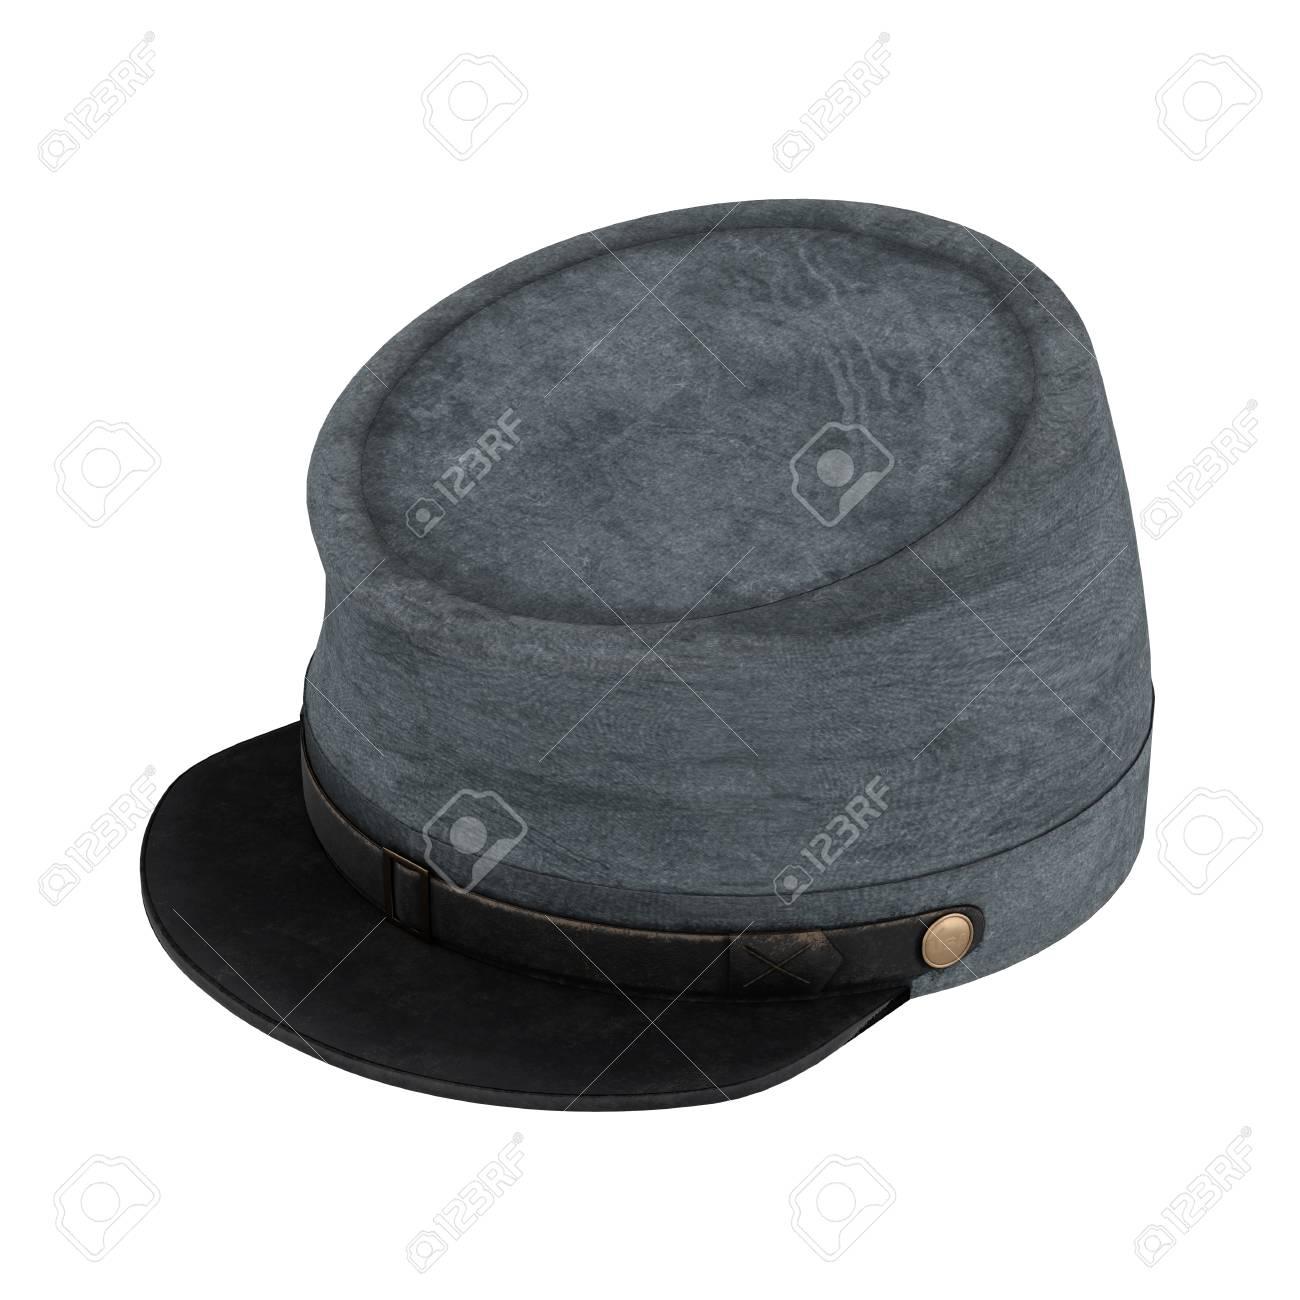 e10c530f377 Civil War Confederate Cavalry Hat. American Confederate Kepi. Perspective  view. 3D render Illustration